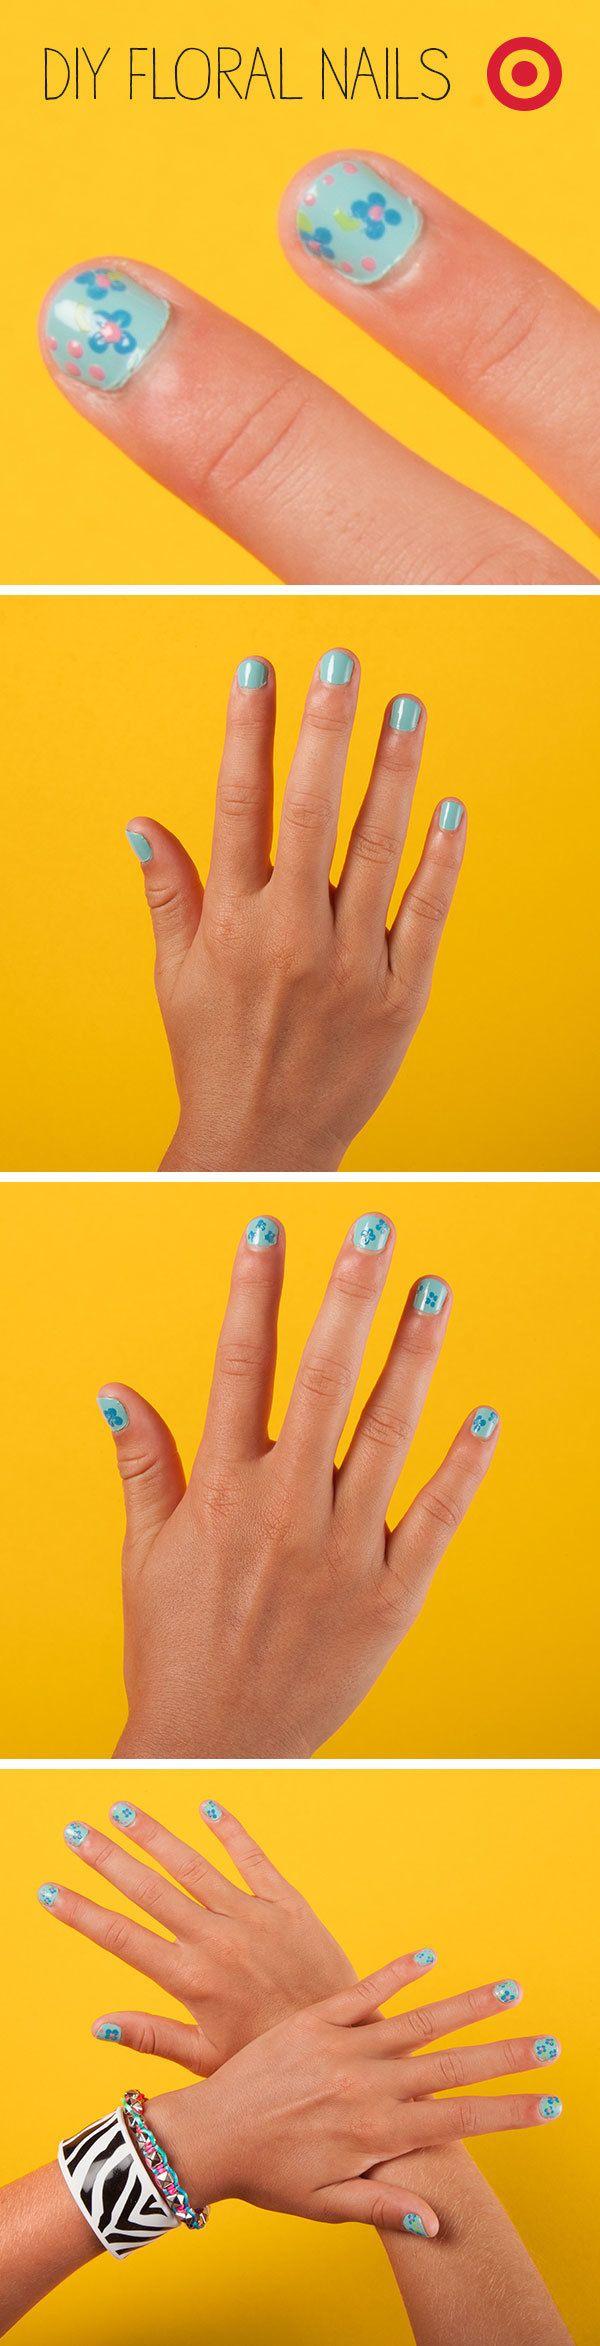 Beauty Lab: We Put 3 Pinterest DIYs to the Test pics